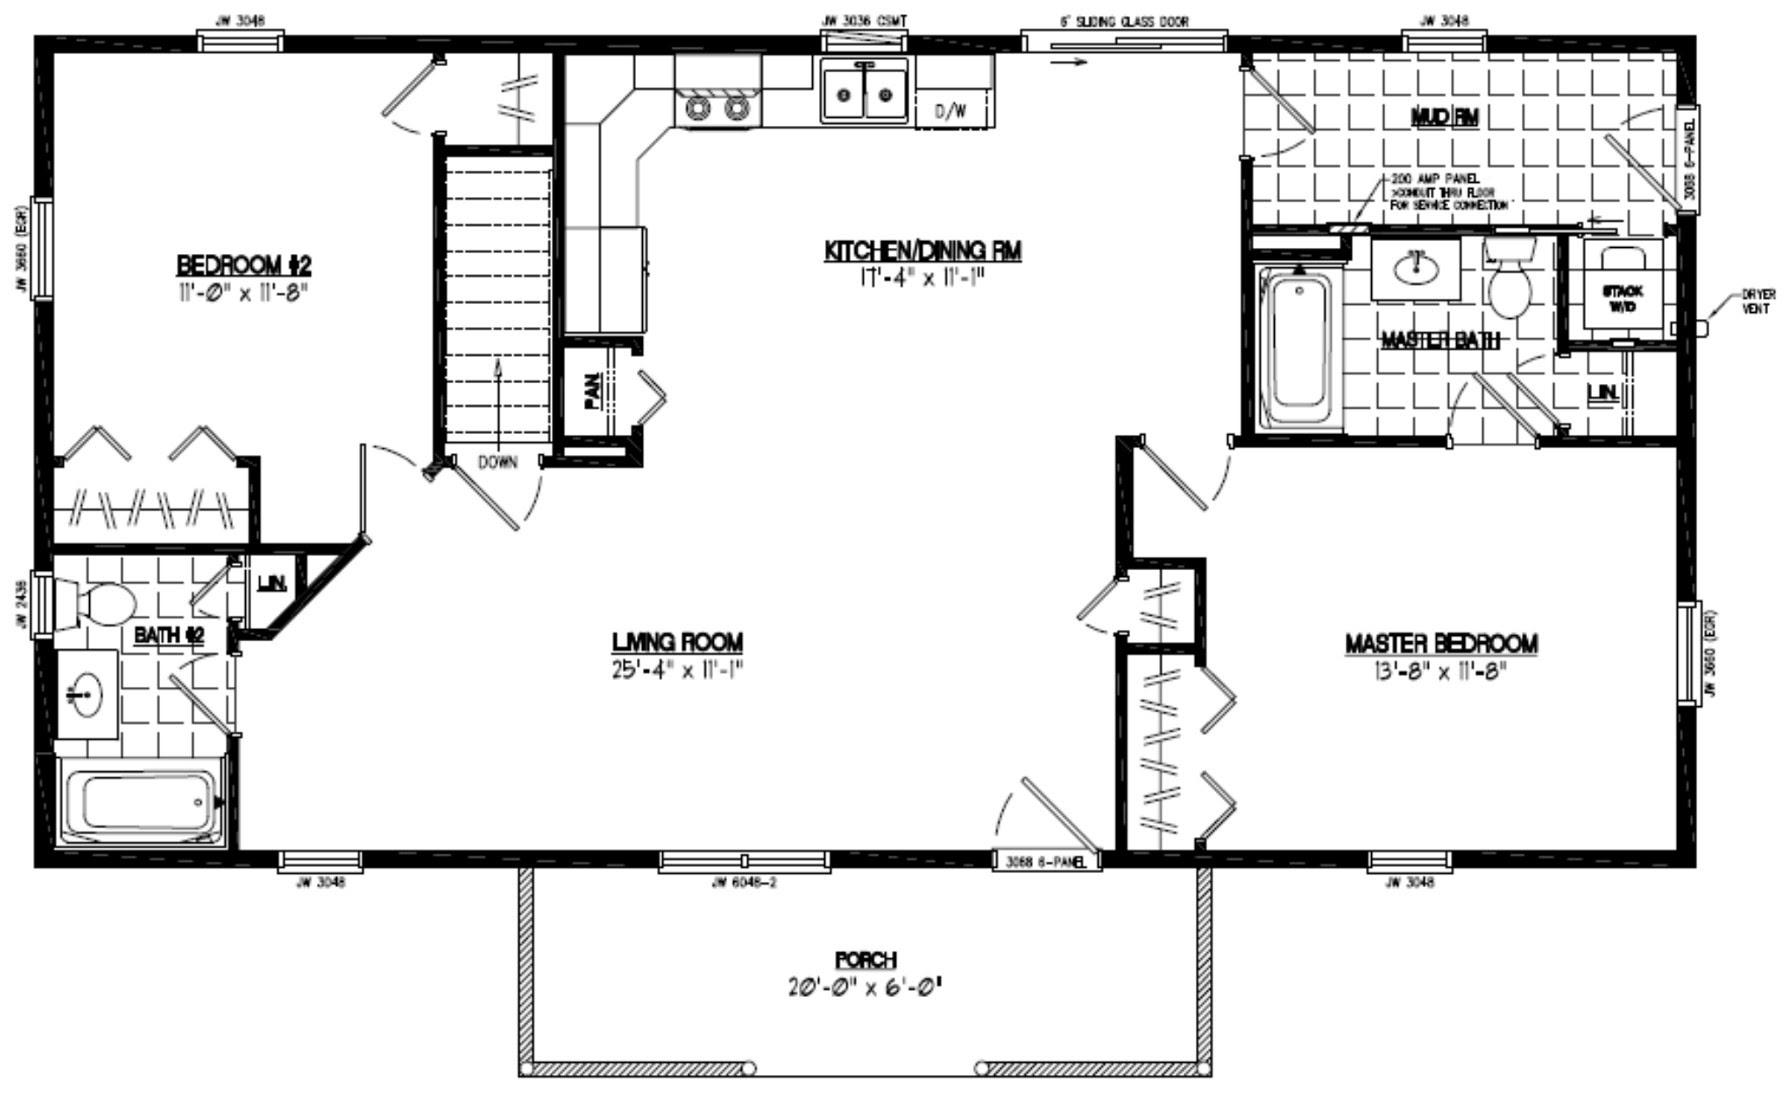 21 Beautiful 24X48 House Plans on 24 x 56 floor plans, 24 x 30 cabin plans, 24 x 40 house plans, 20 x 48 house plans, 24 x 24 house floor plans, 24 x 30 floor plans house, 40 x 48 house plans, 24 x 38 house plans, 24 x 32 house plans, 36 x 48 house plans, 22 x 48 house plans, 21 x 48 house plans, 24 x 42 house plans, 24 x 36 house plans, 28 x 48 house plans, 1000 sq ft. house floor plans, 32 x 48 house plans, 12 x 24 house plans, 26 x 48 house plans, 48 x 48 house plans,